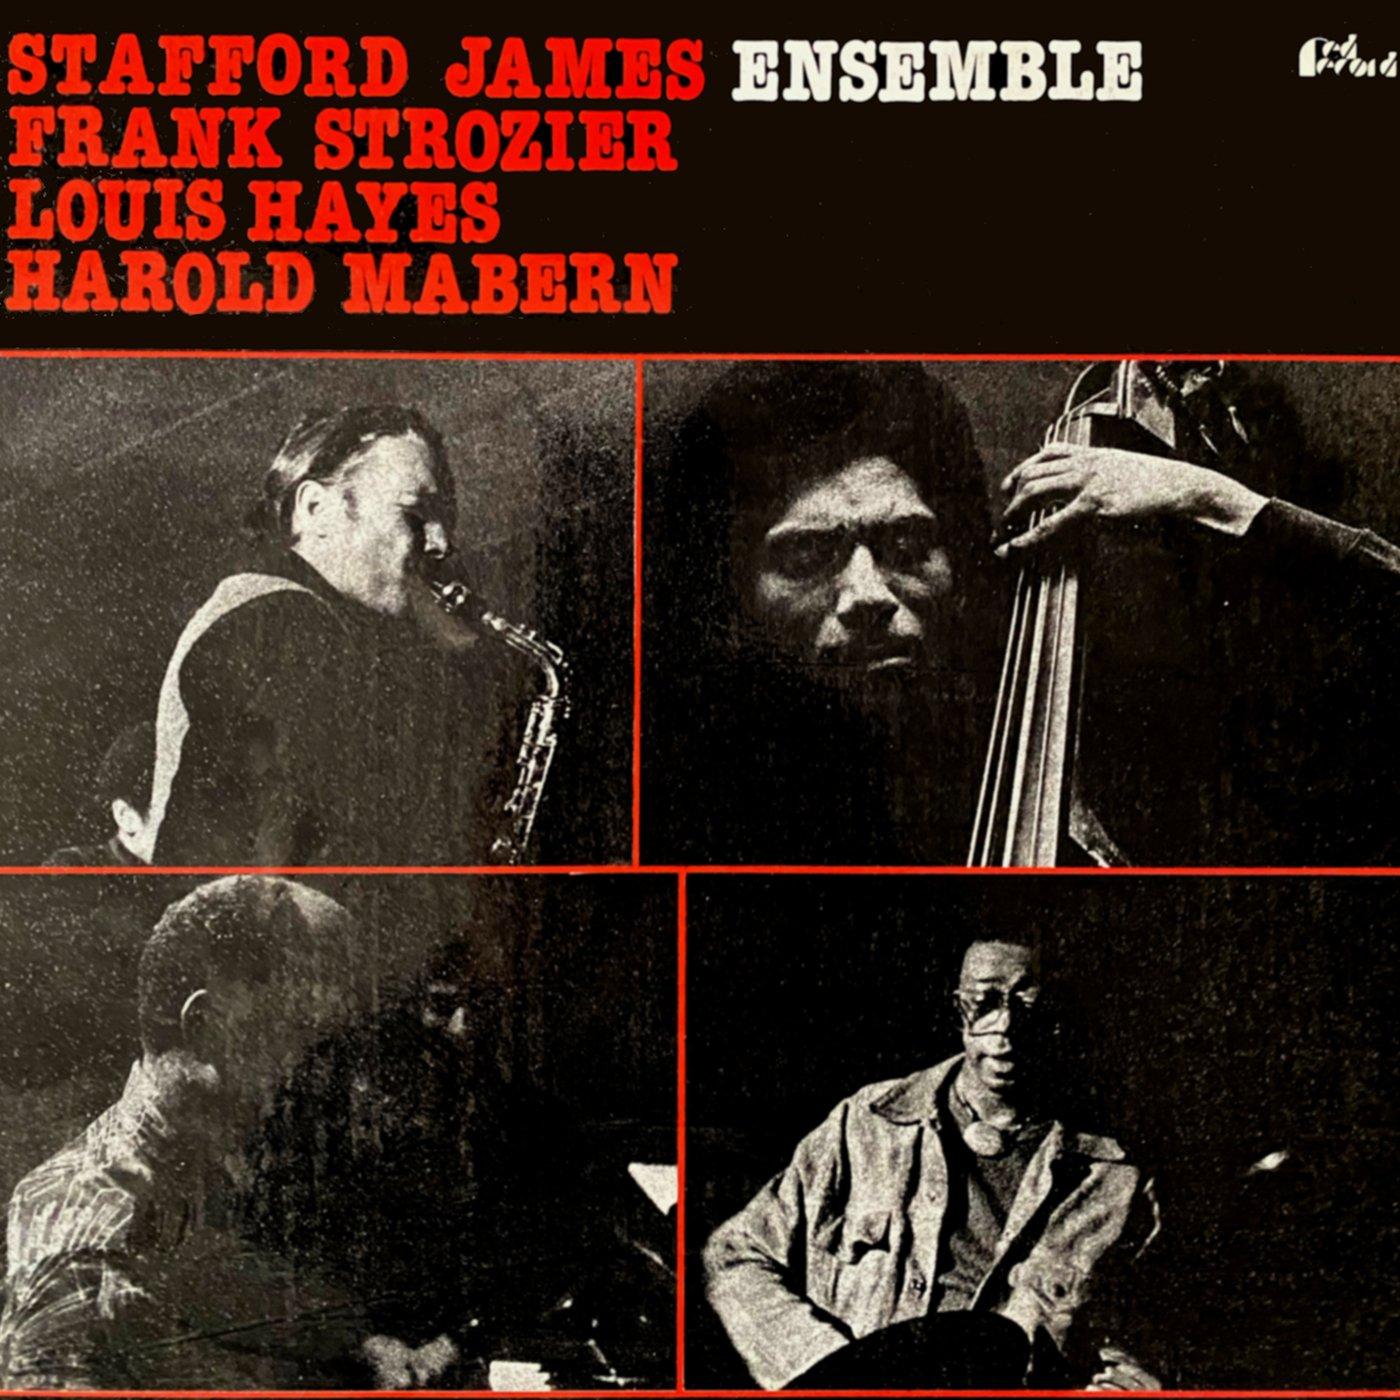 Stafford James Ensemble - Stafford James Ensemble